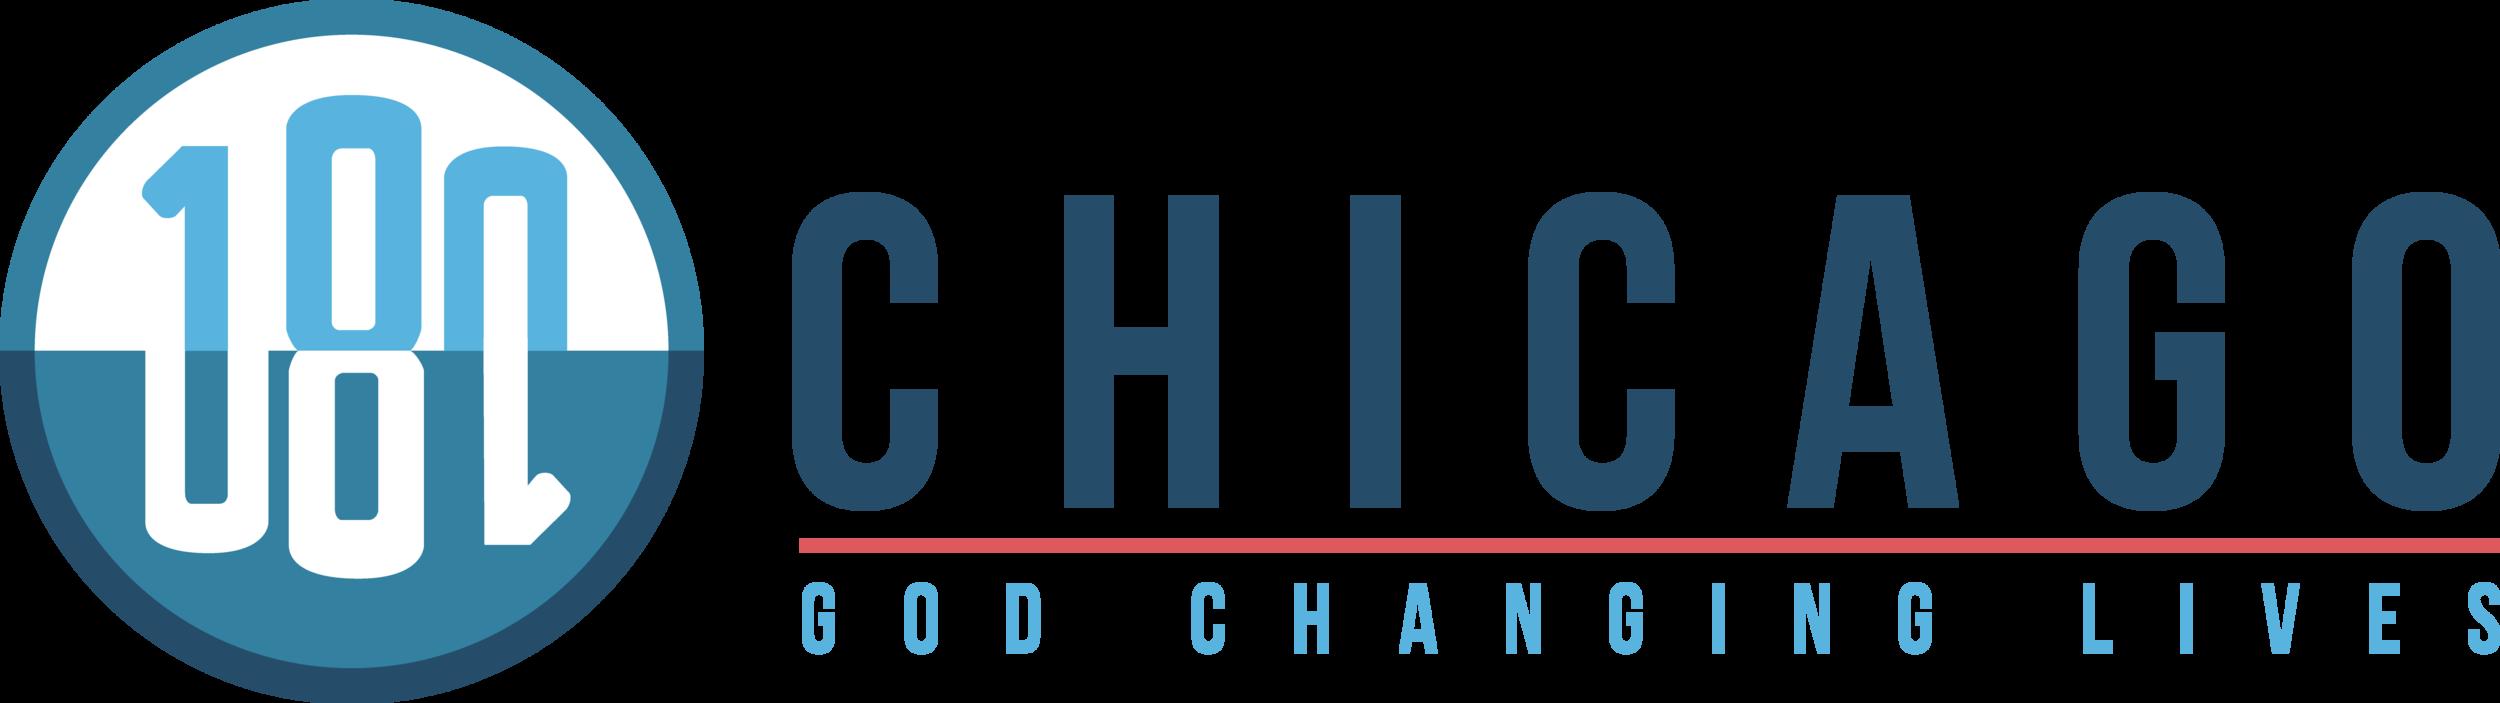 180Chicago-Logo.png